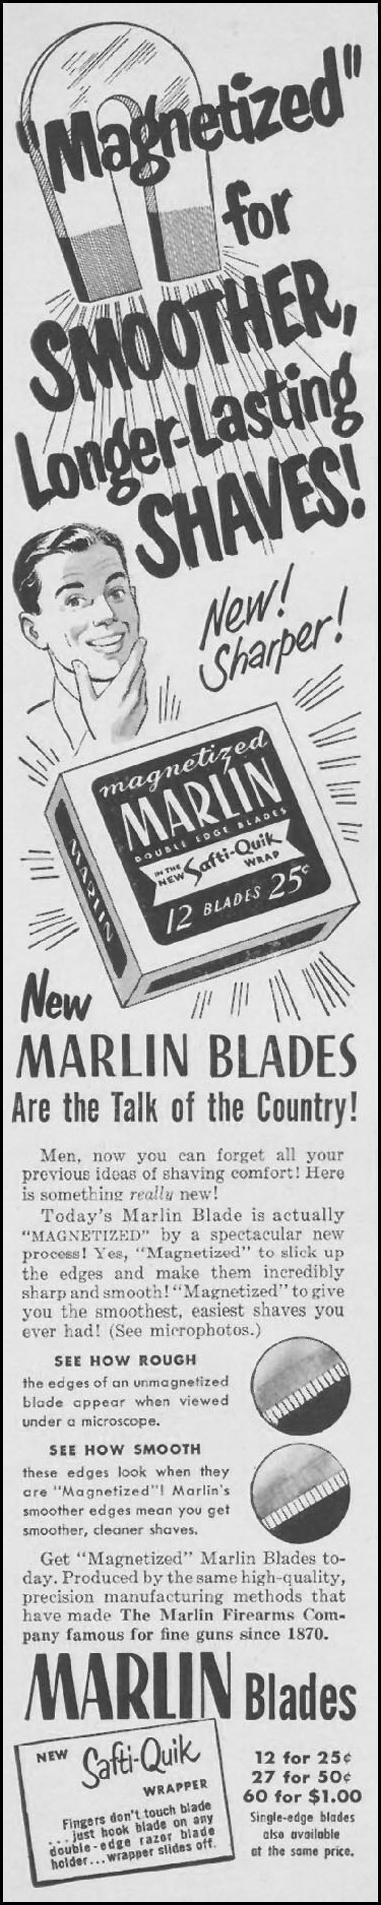 MARLIN RAZOR BLADES LIFE 07/02/1951 p. 32